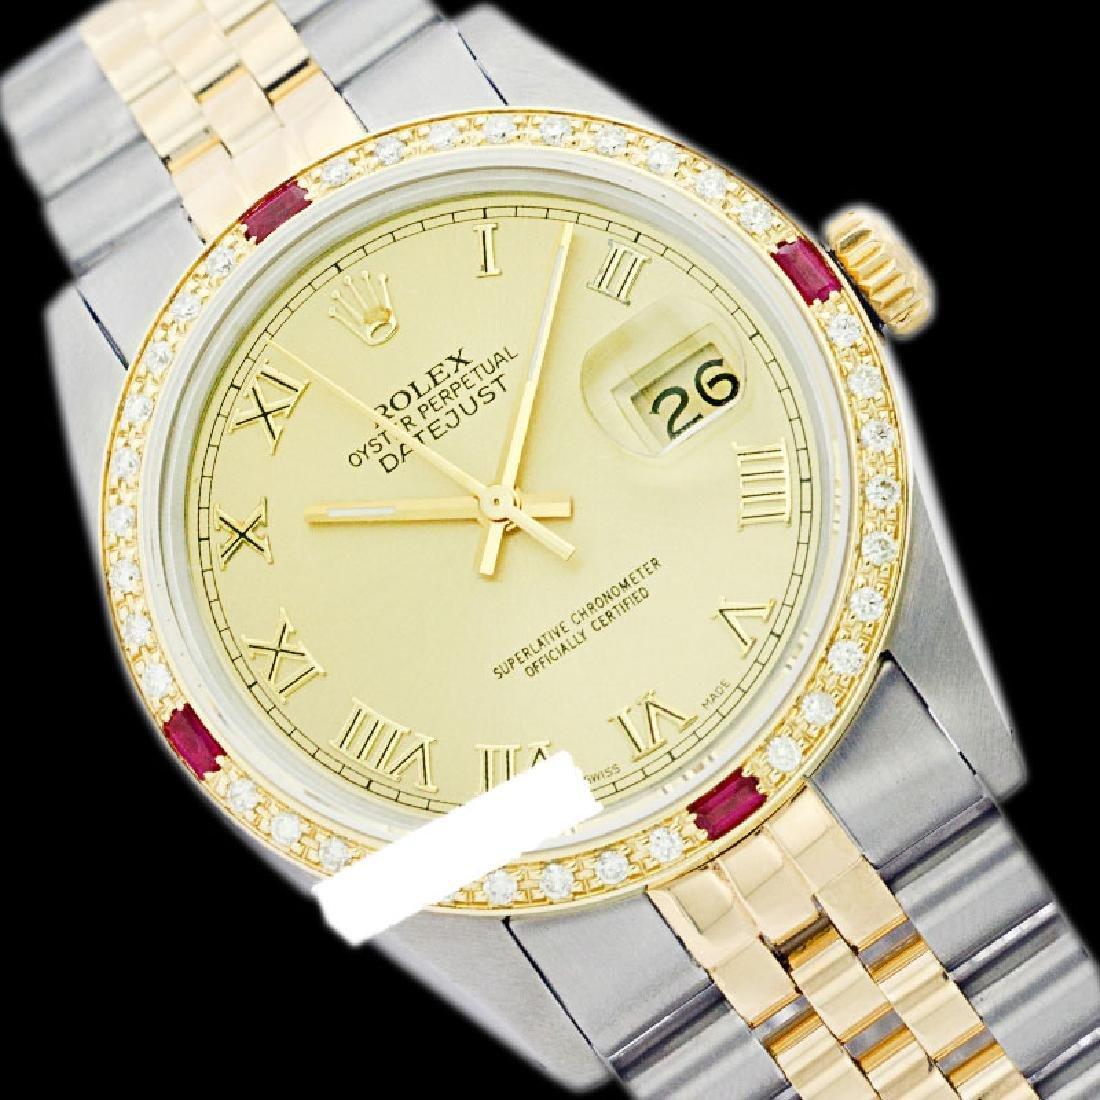 Rolex Men's Two Tone 14K Gold/SS, QuickSet, Roman Dial